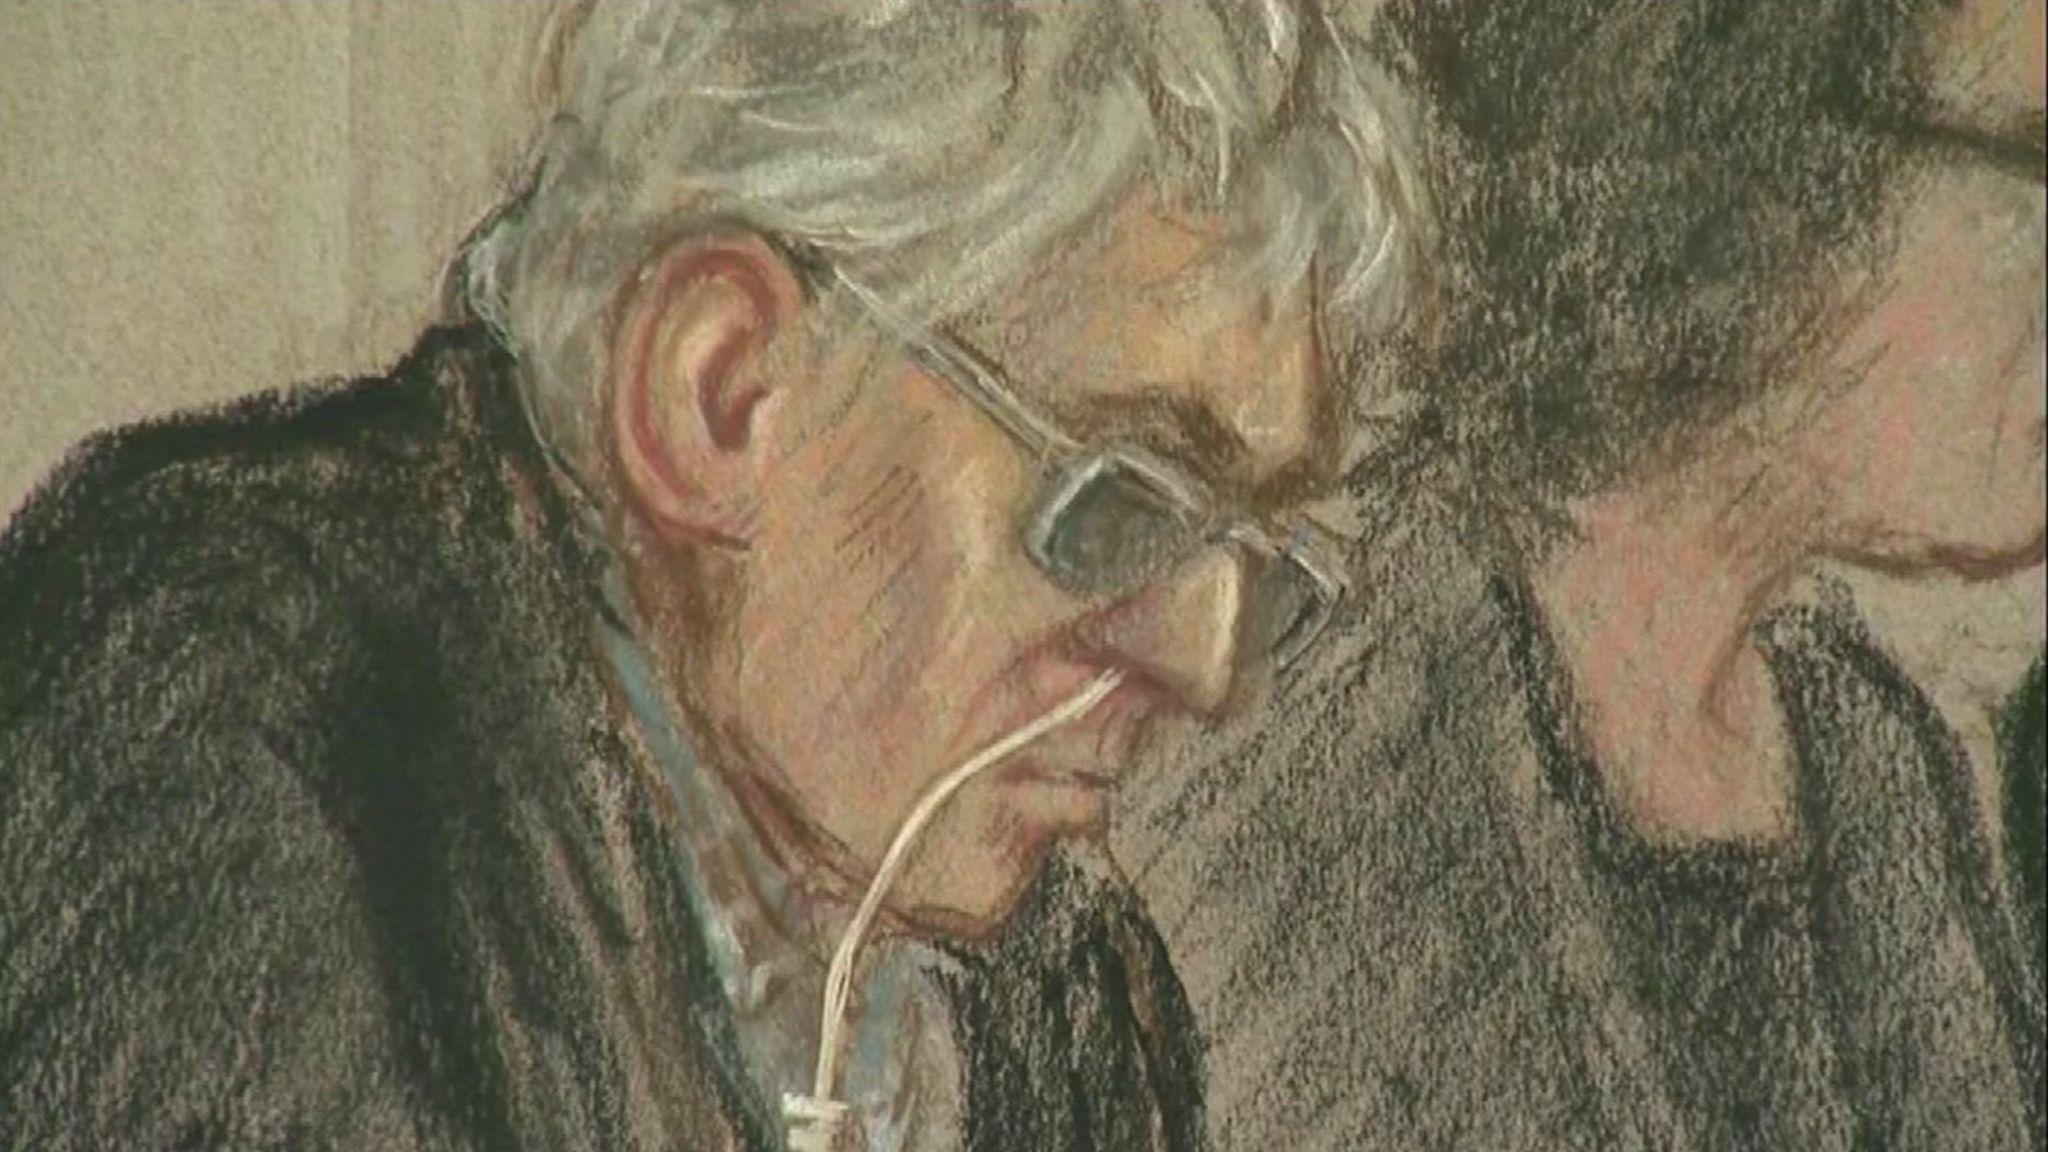 Court artist sketch of Ian Brady